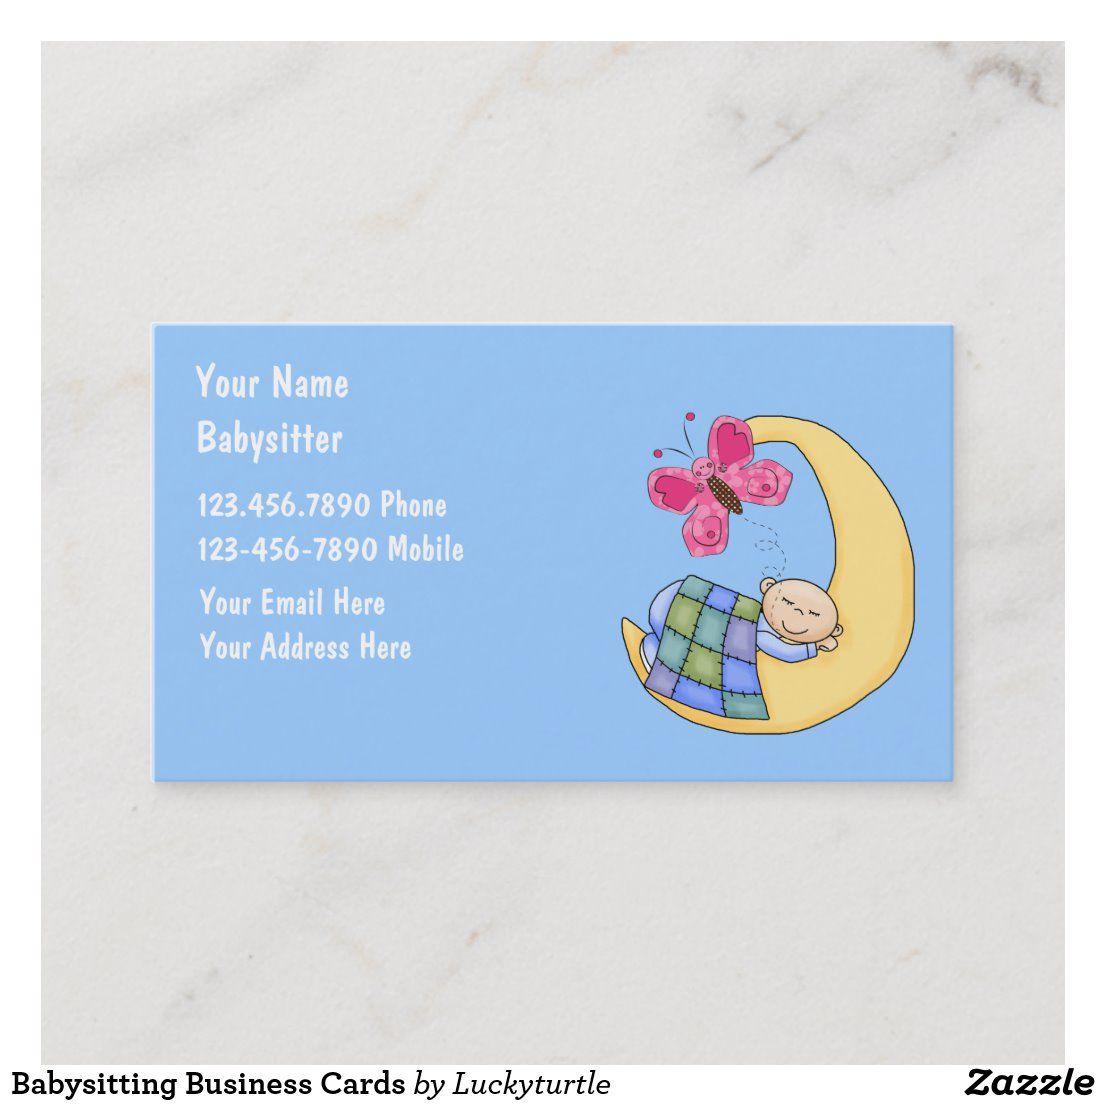 Babysitting Business Cards Zazzle Com Business Card Design Business Cards Kids Daycare